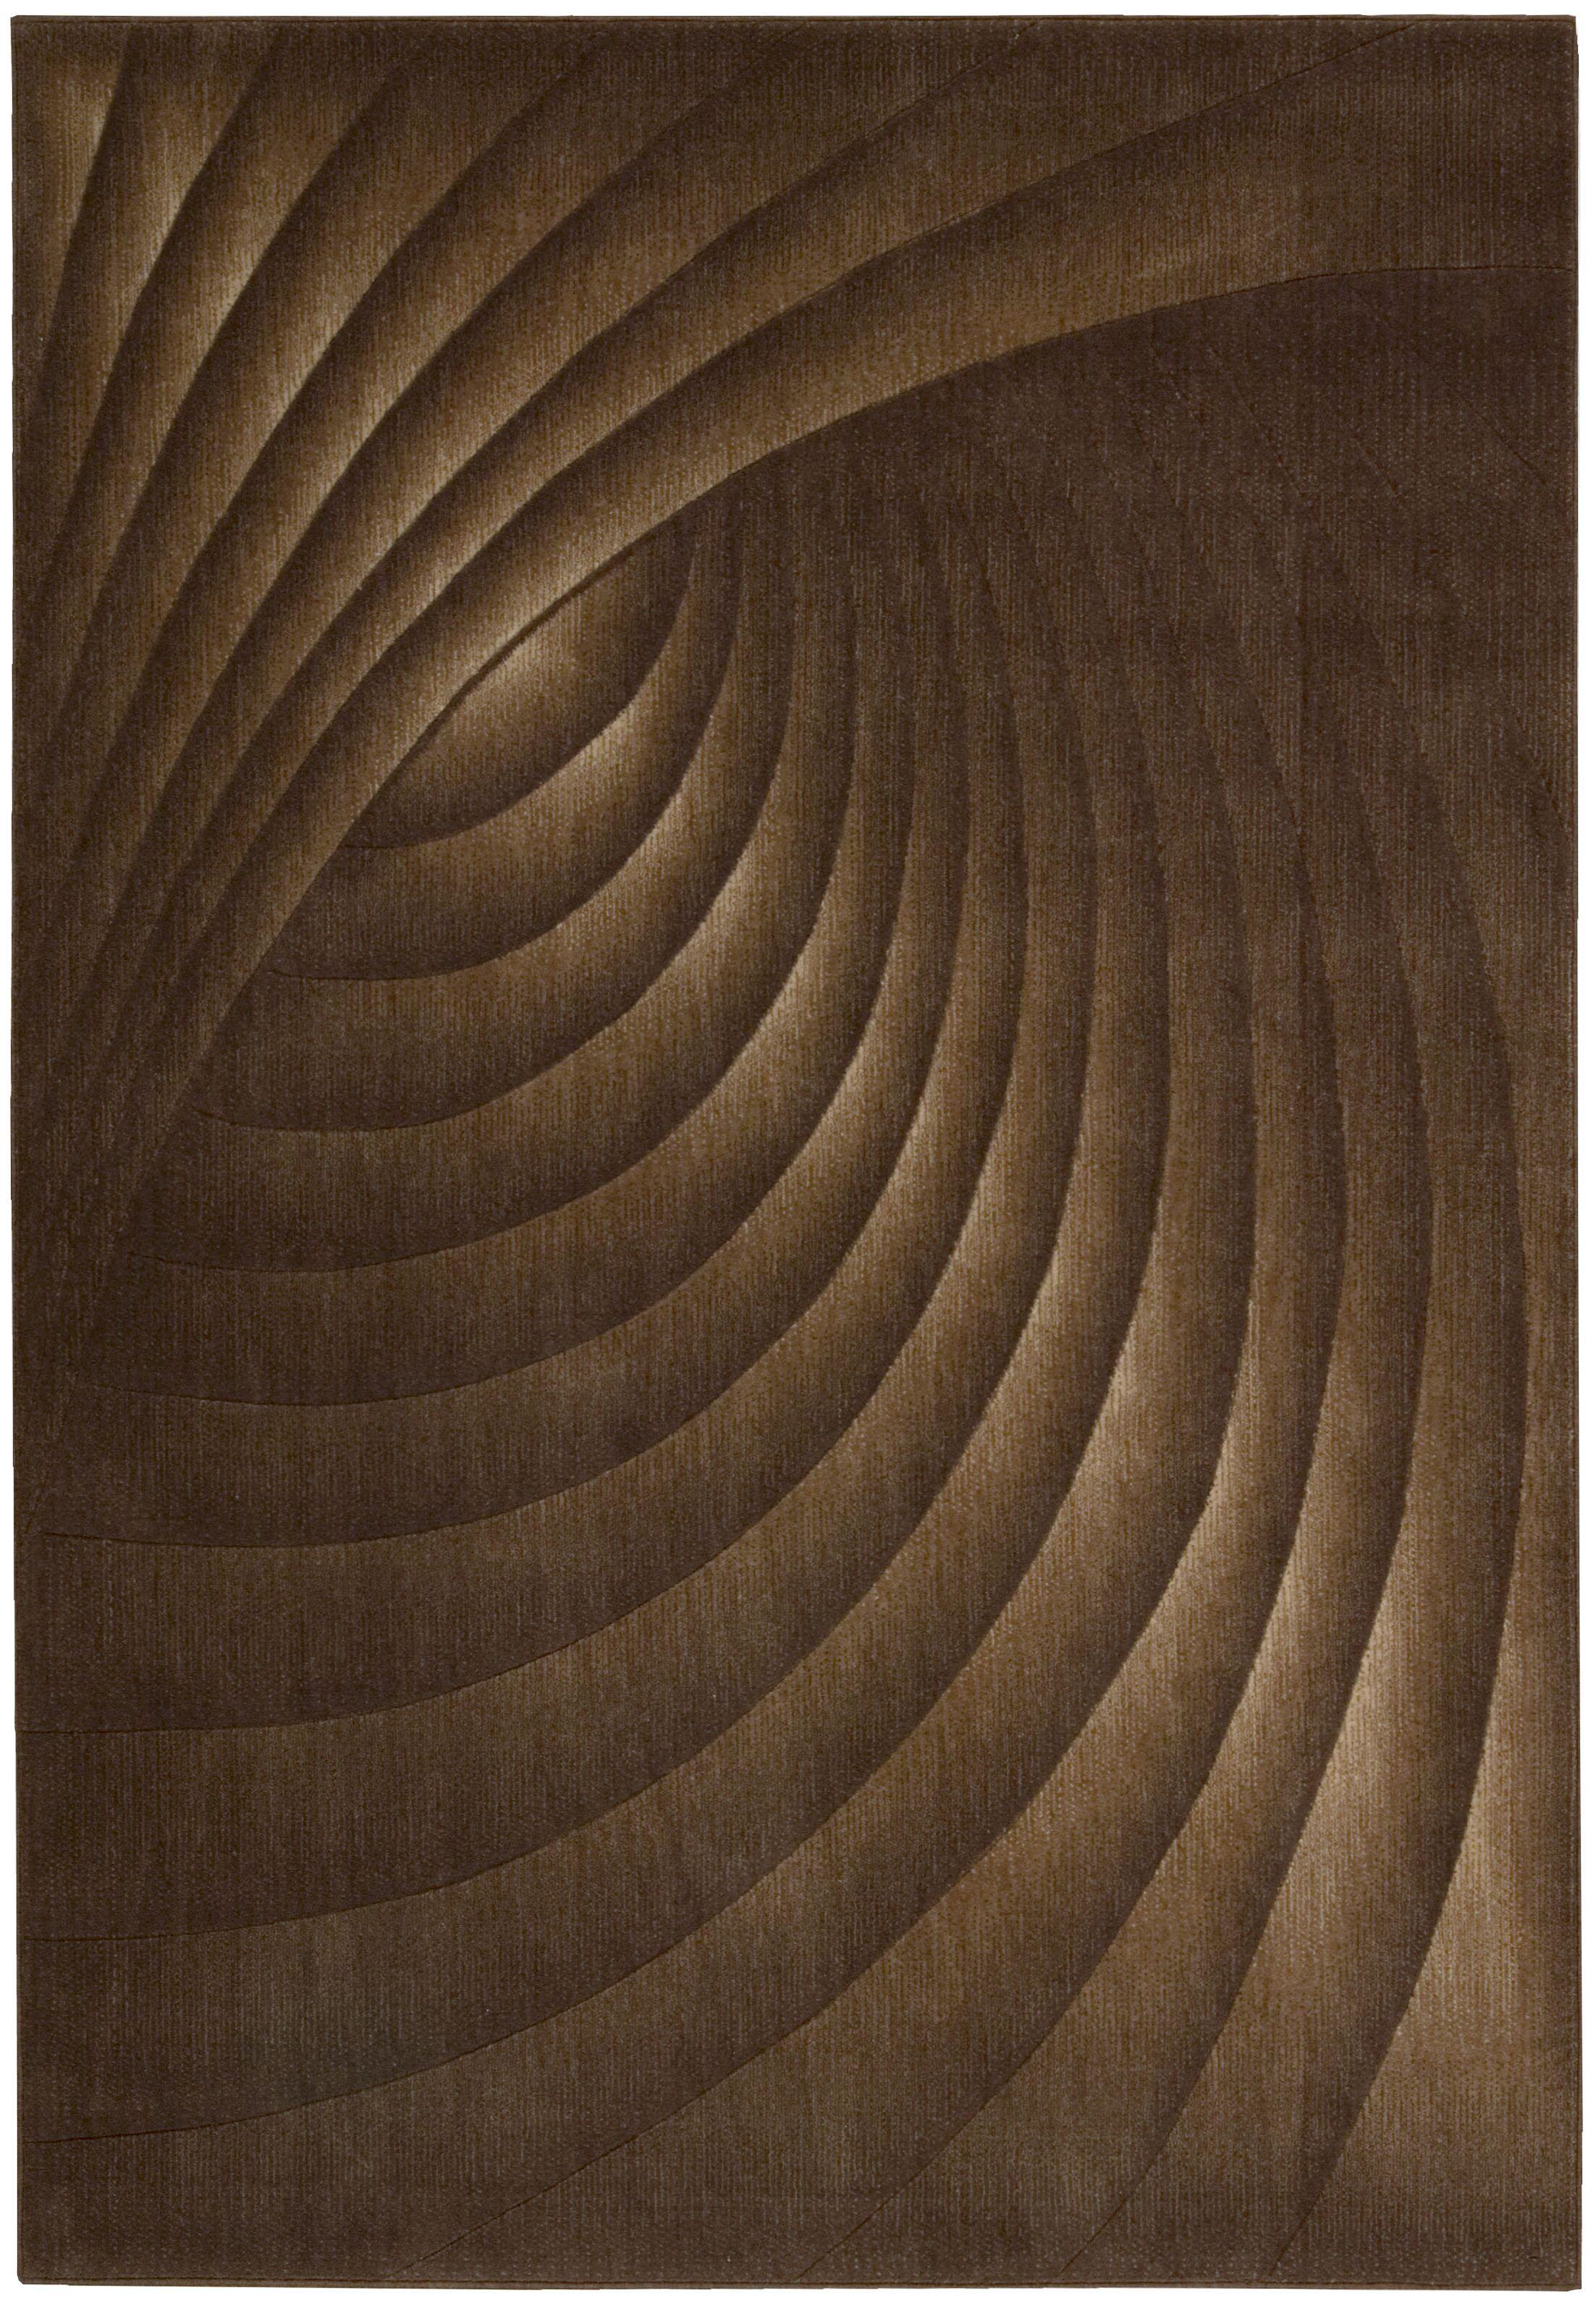 Patrica Chocolate Rug Rug Size: Rectangle 7'9